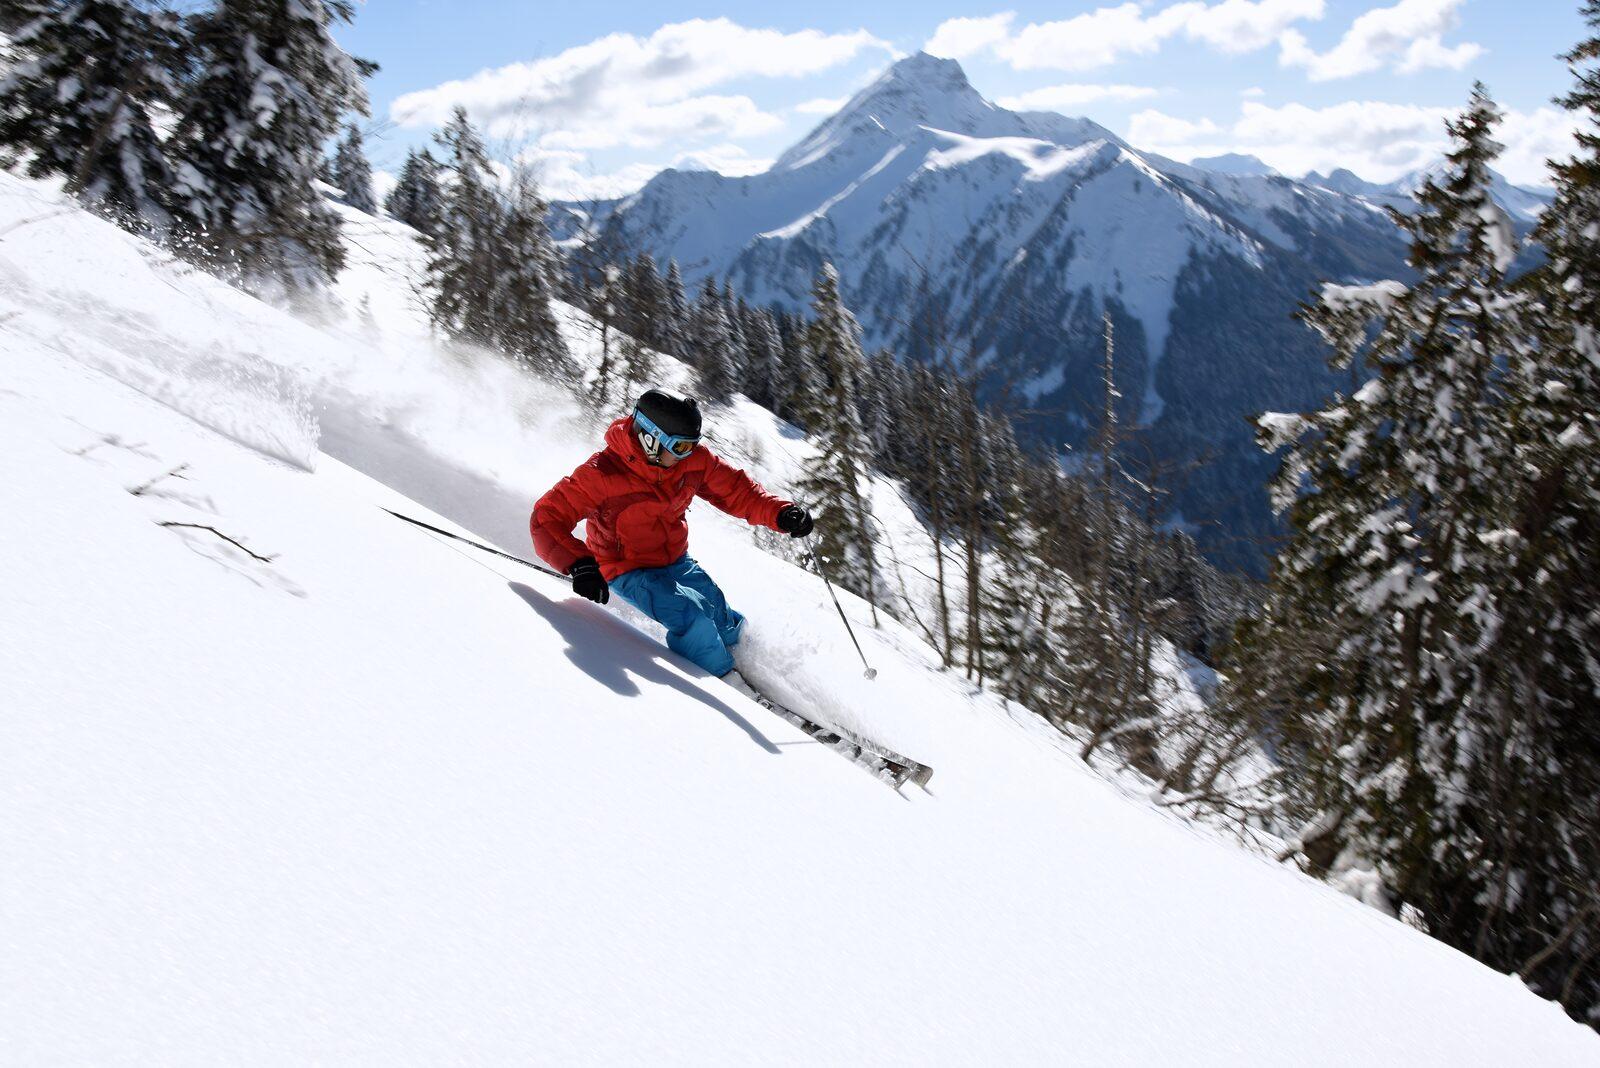 The most steep slopes of Les Portes du Soleil